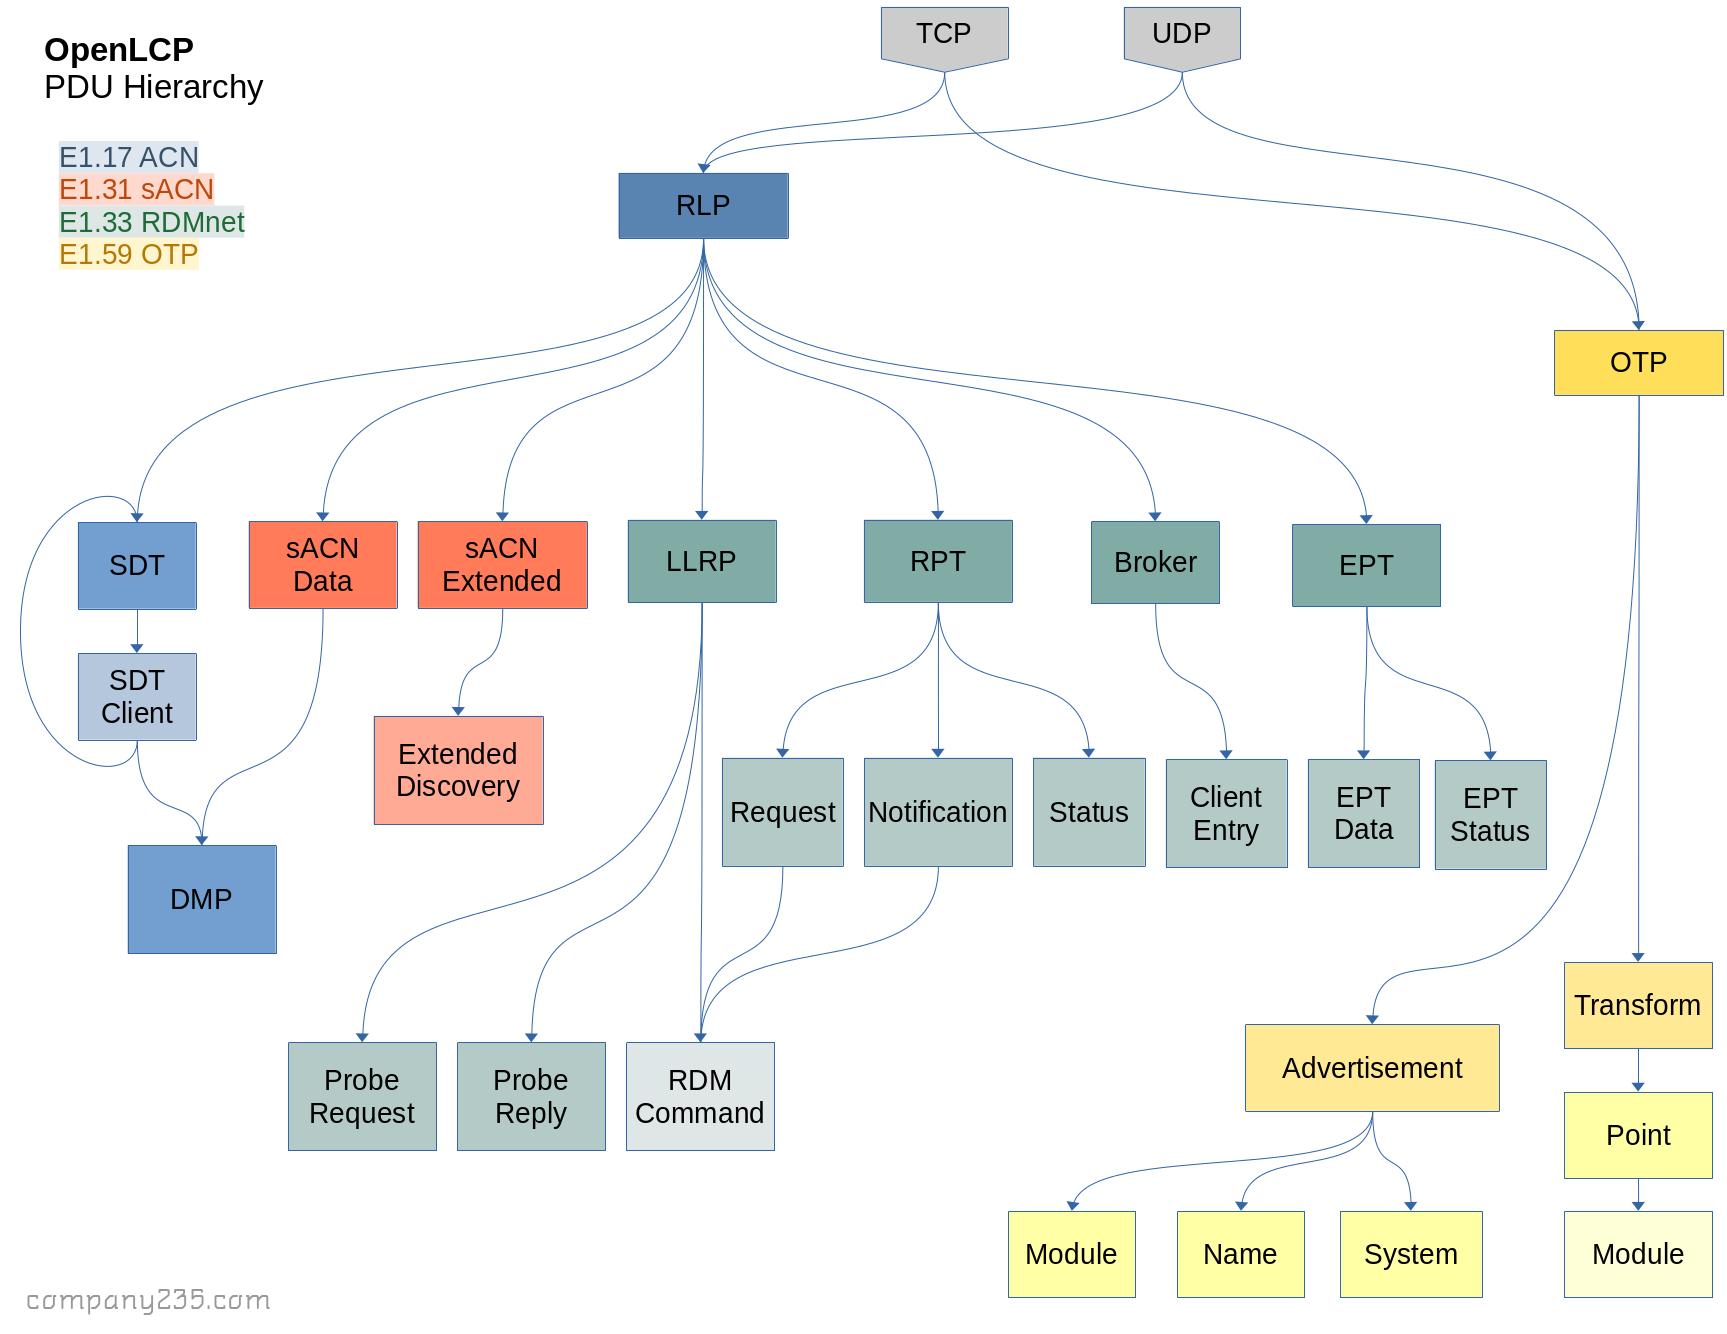 PDU Hierarch Flowchart